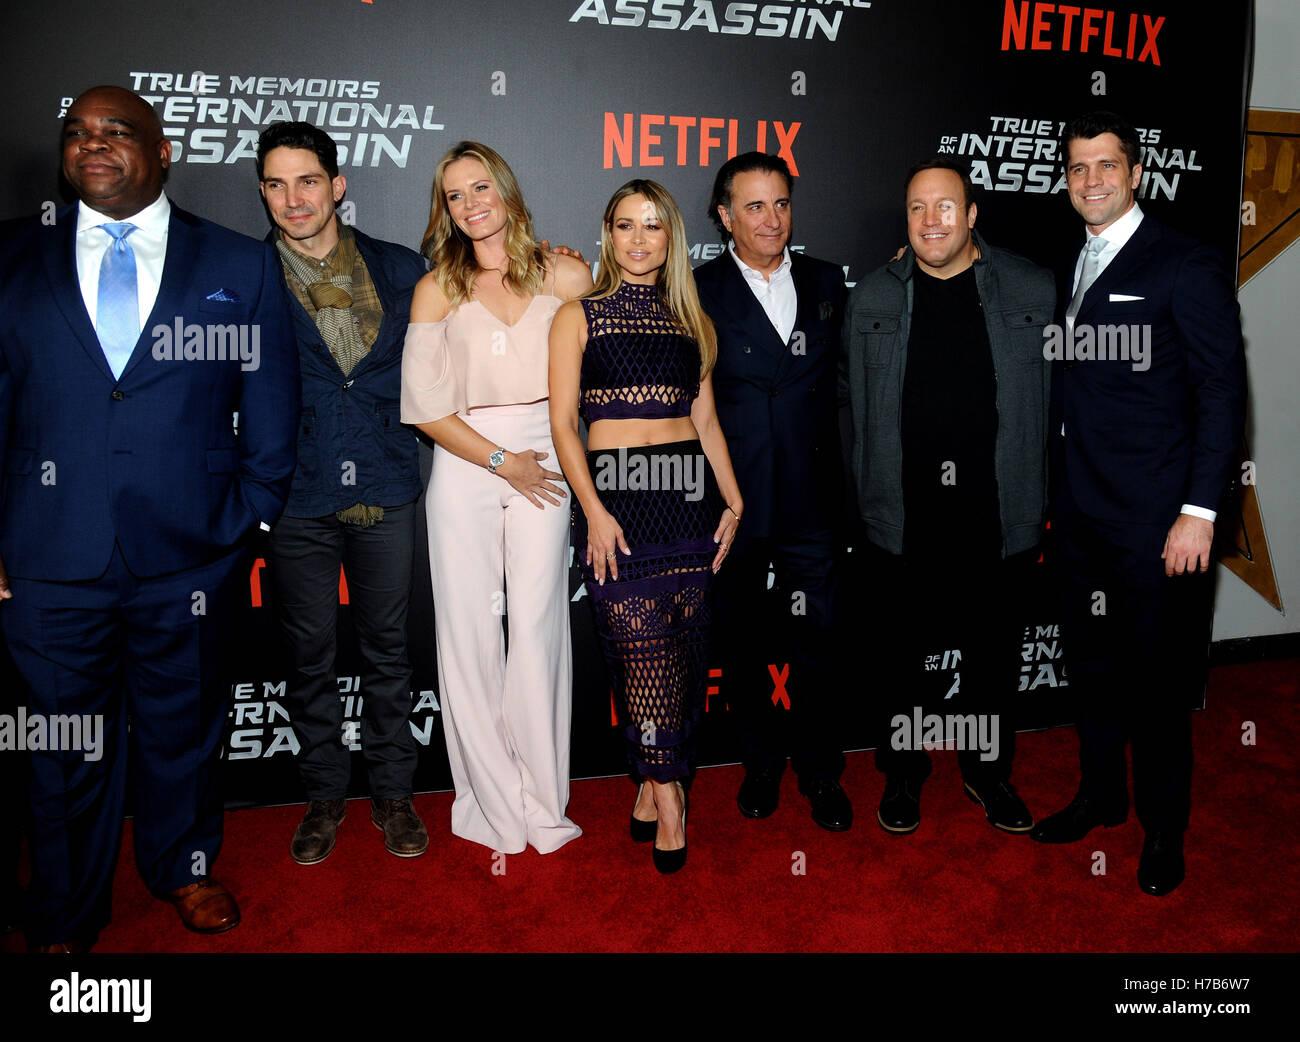 New York, NY, USA. 3. November 2016. Leonard Earl Howze, Maurice Compte, Lauren Shaw, Zulay Henao, Andy Garcia, Stockbild